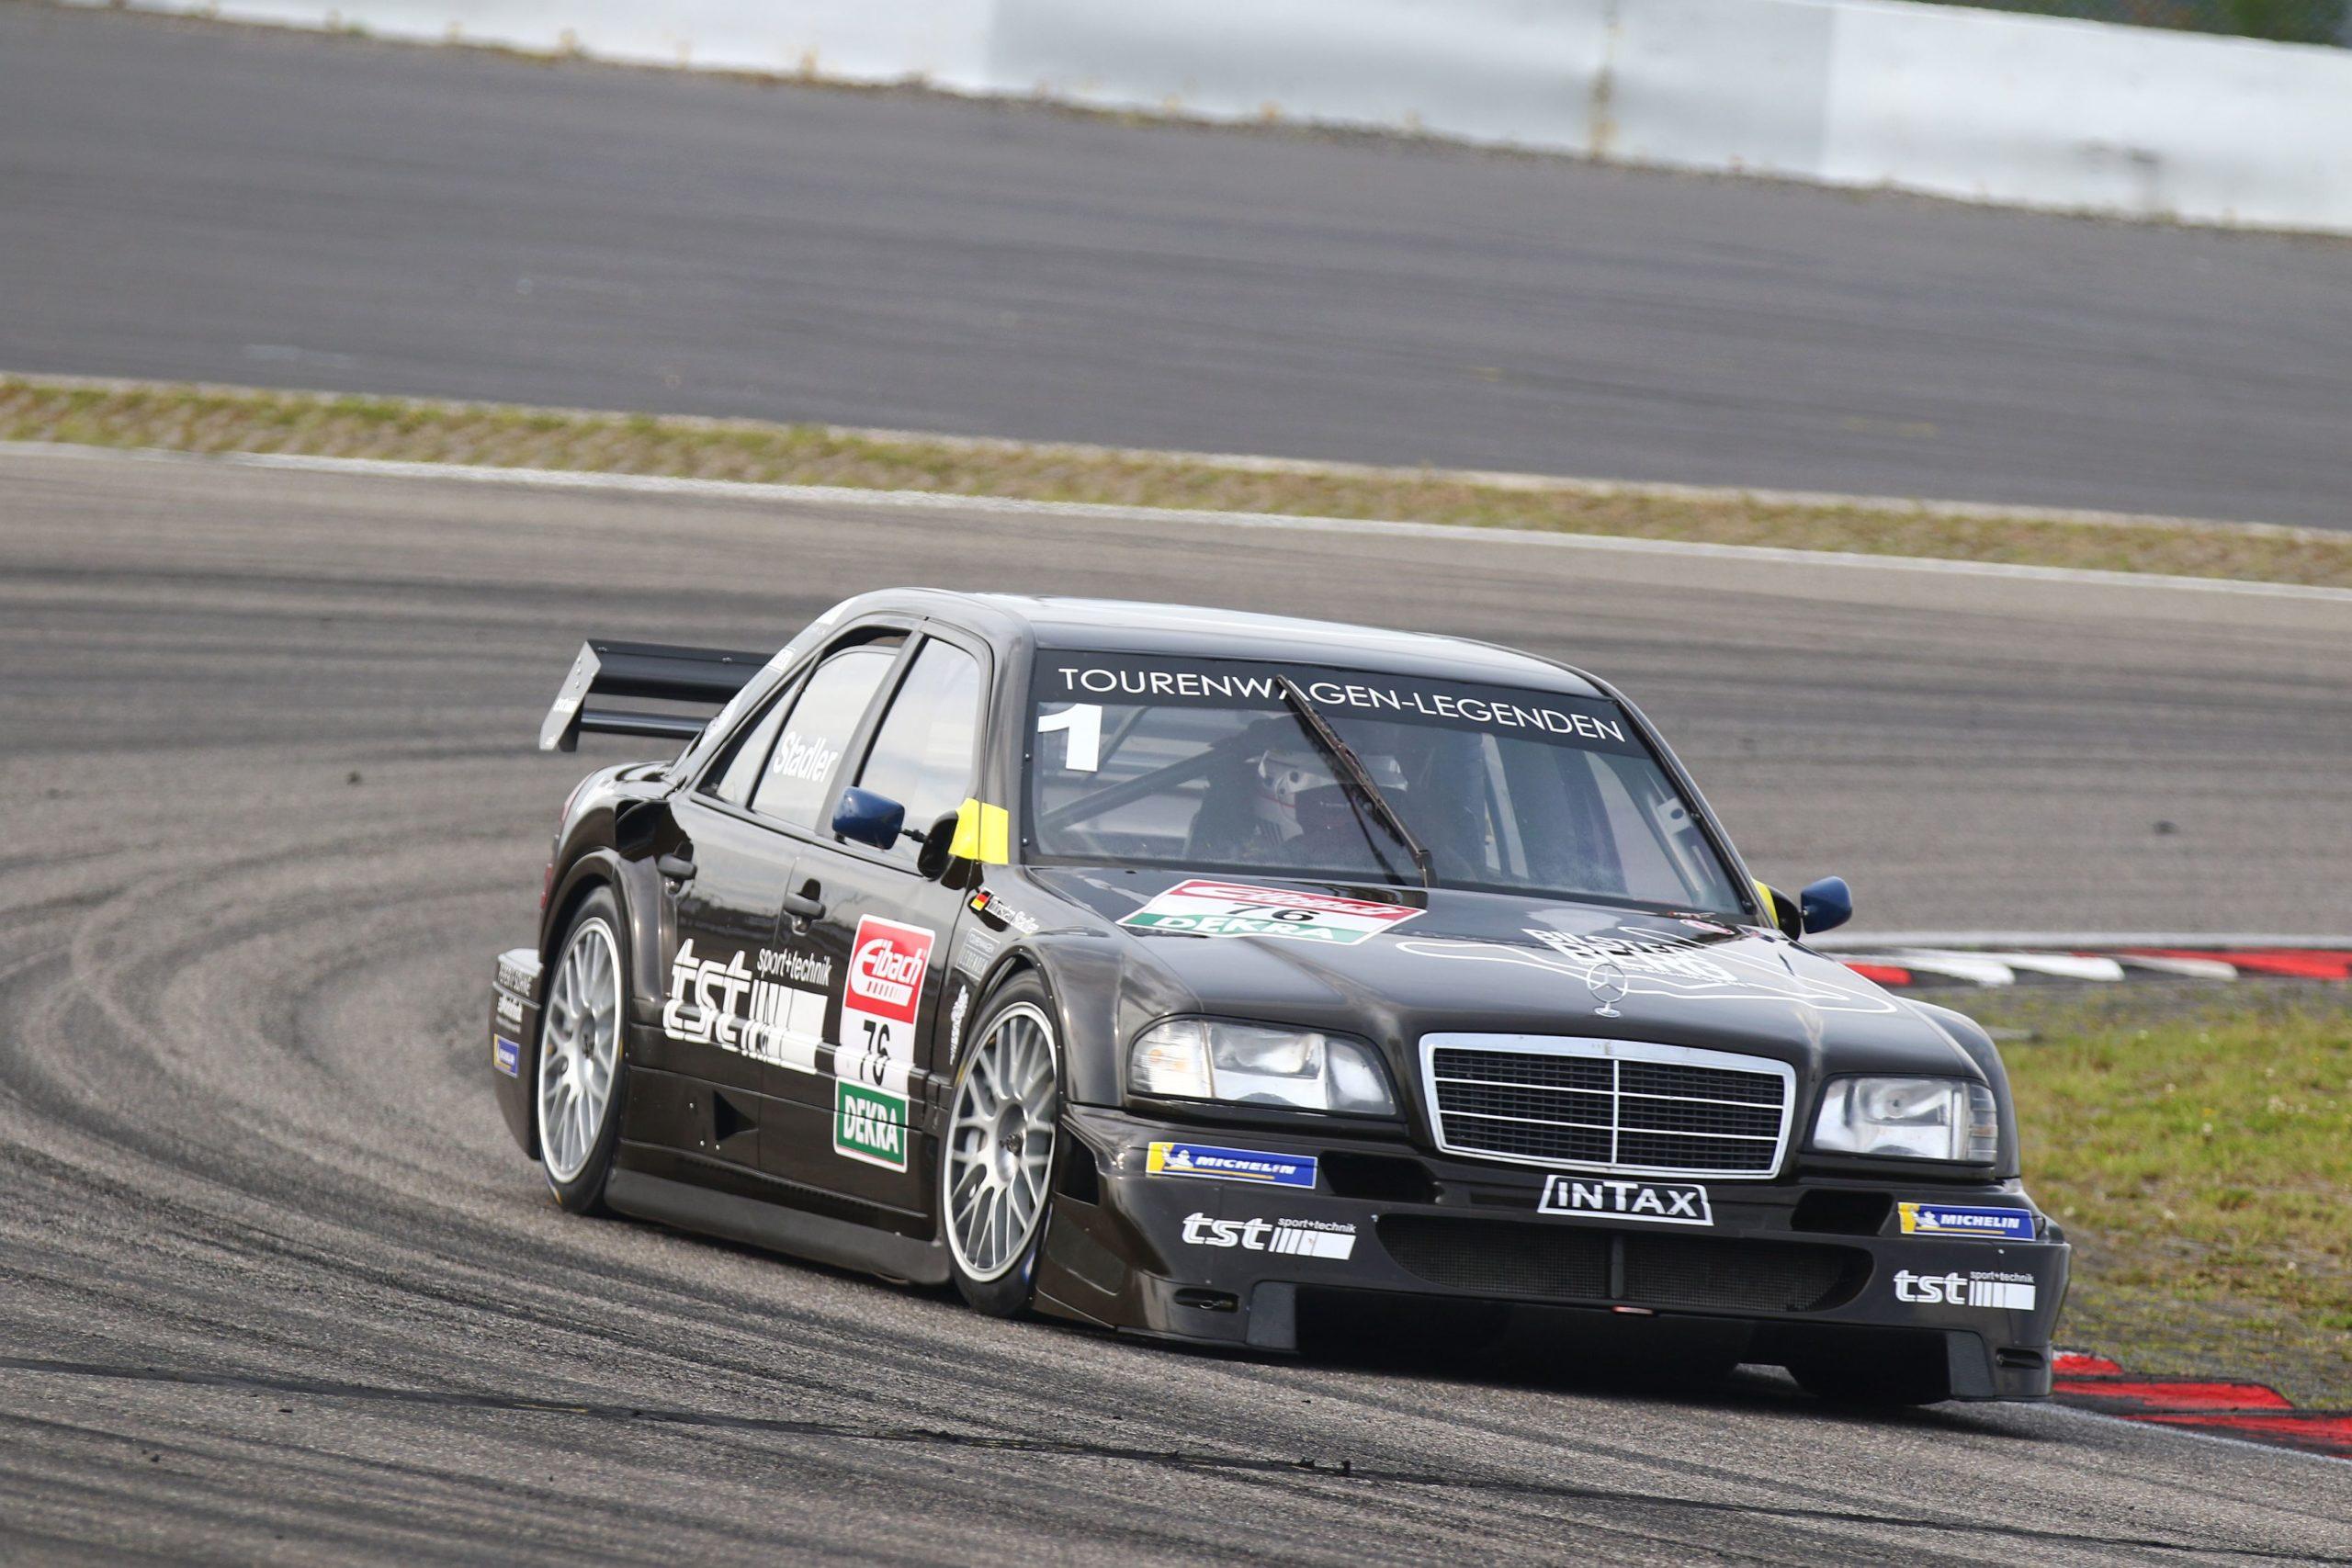 2021-DTM-Classic-Nuerburgring-tst-sport-und-technik-Mercedes-Benz-C-Klasse-Thorsten-Stadler-2116966